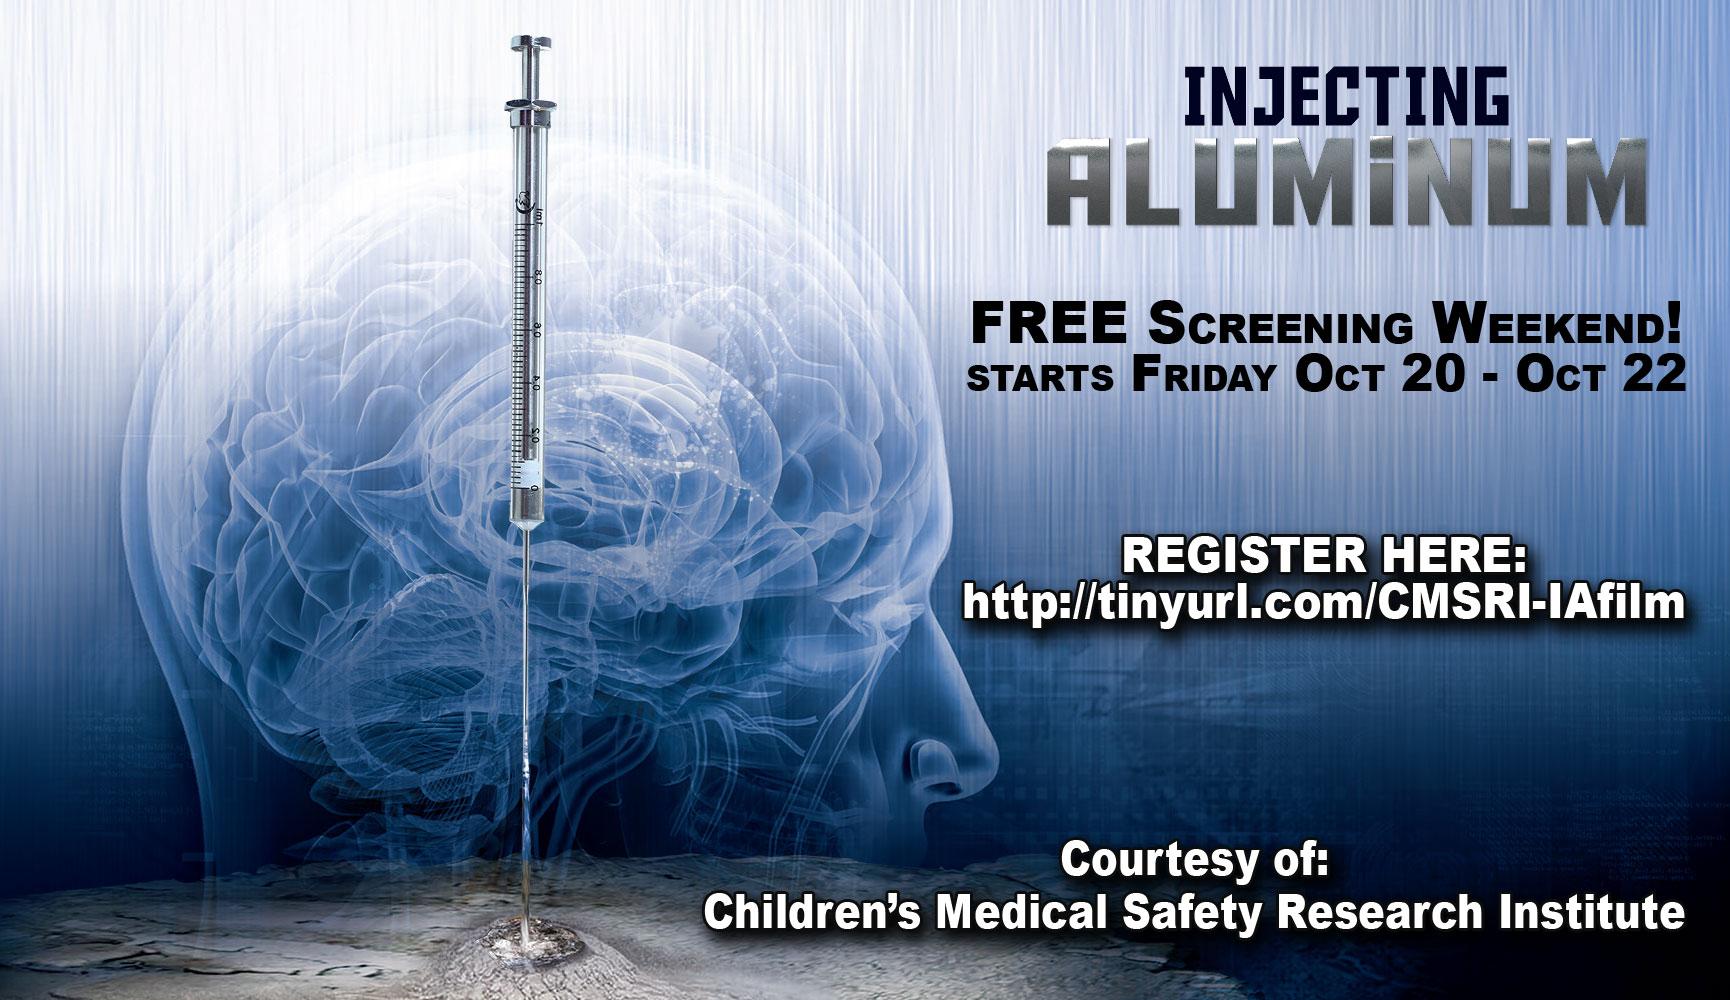 Injecting-Aluminum-Affiliate-CMSRI.jpg